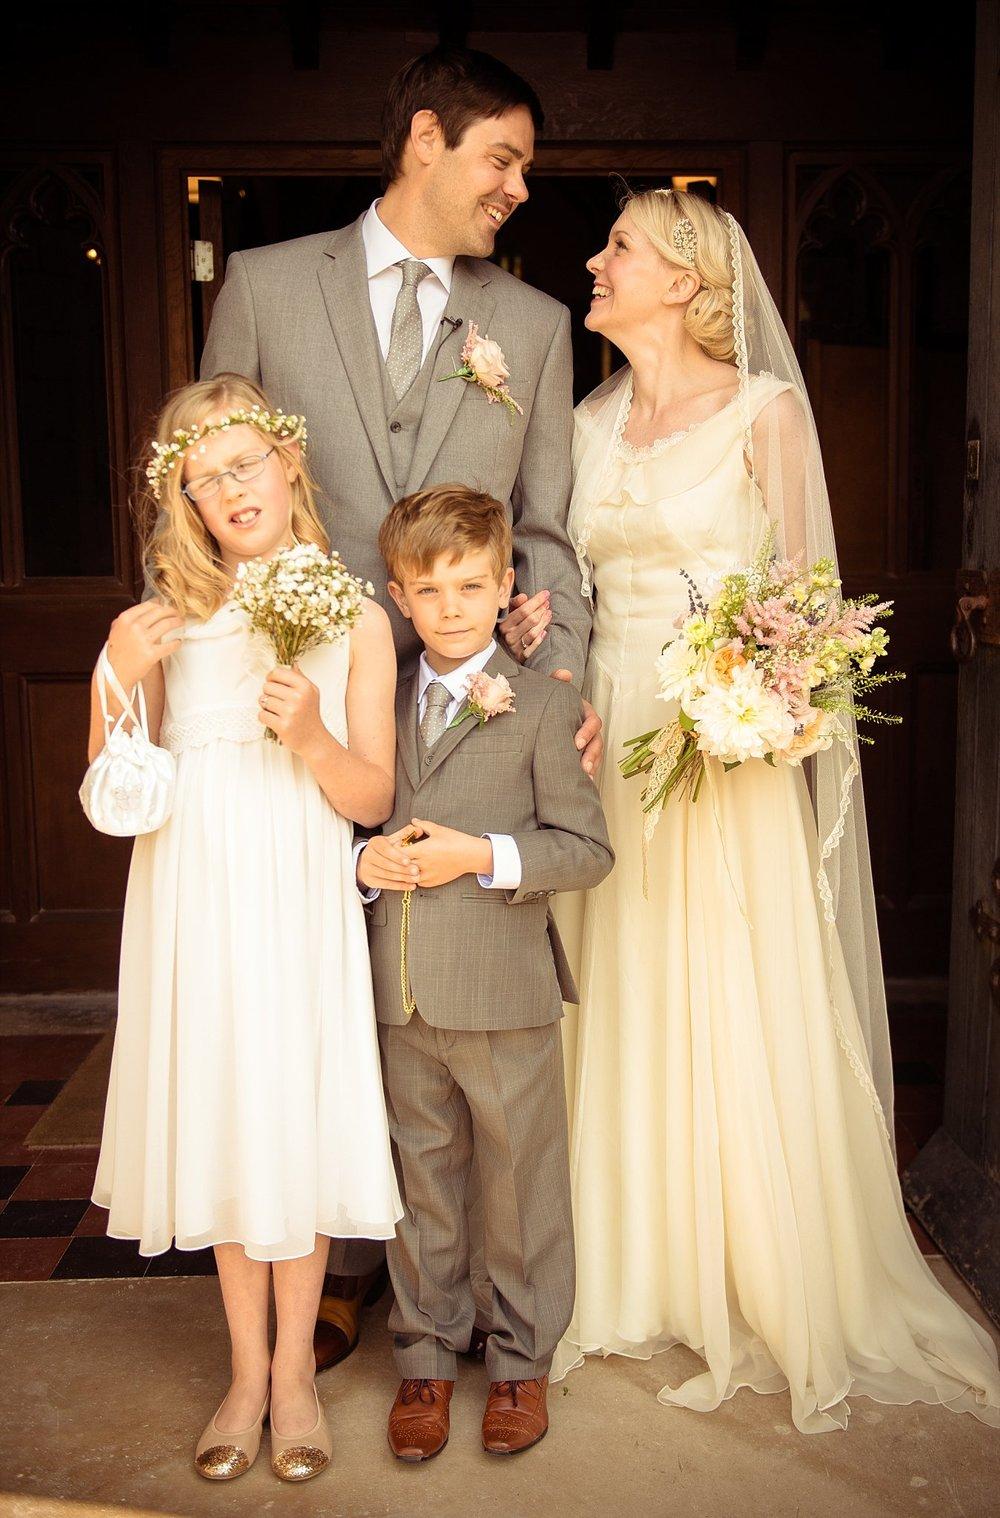 Vintage Amy Wedding Styling-My Vintage Wedding-1930s Wedding Dress and Vintage Flowers